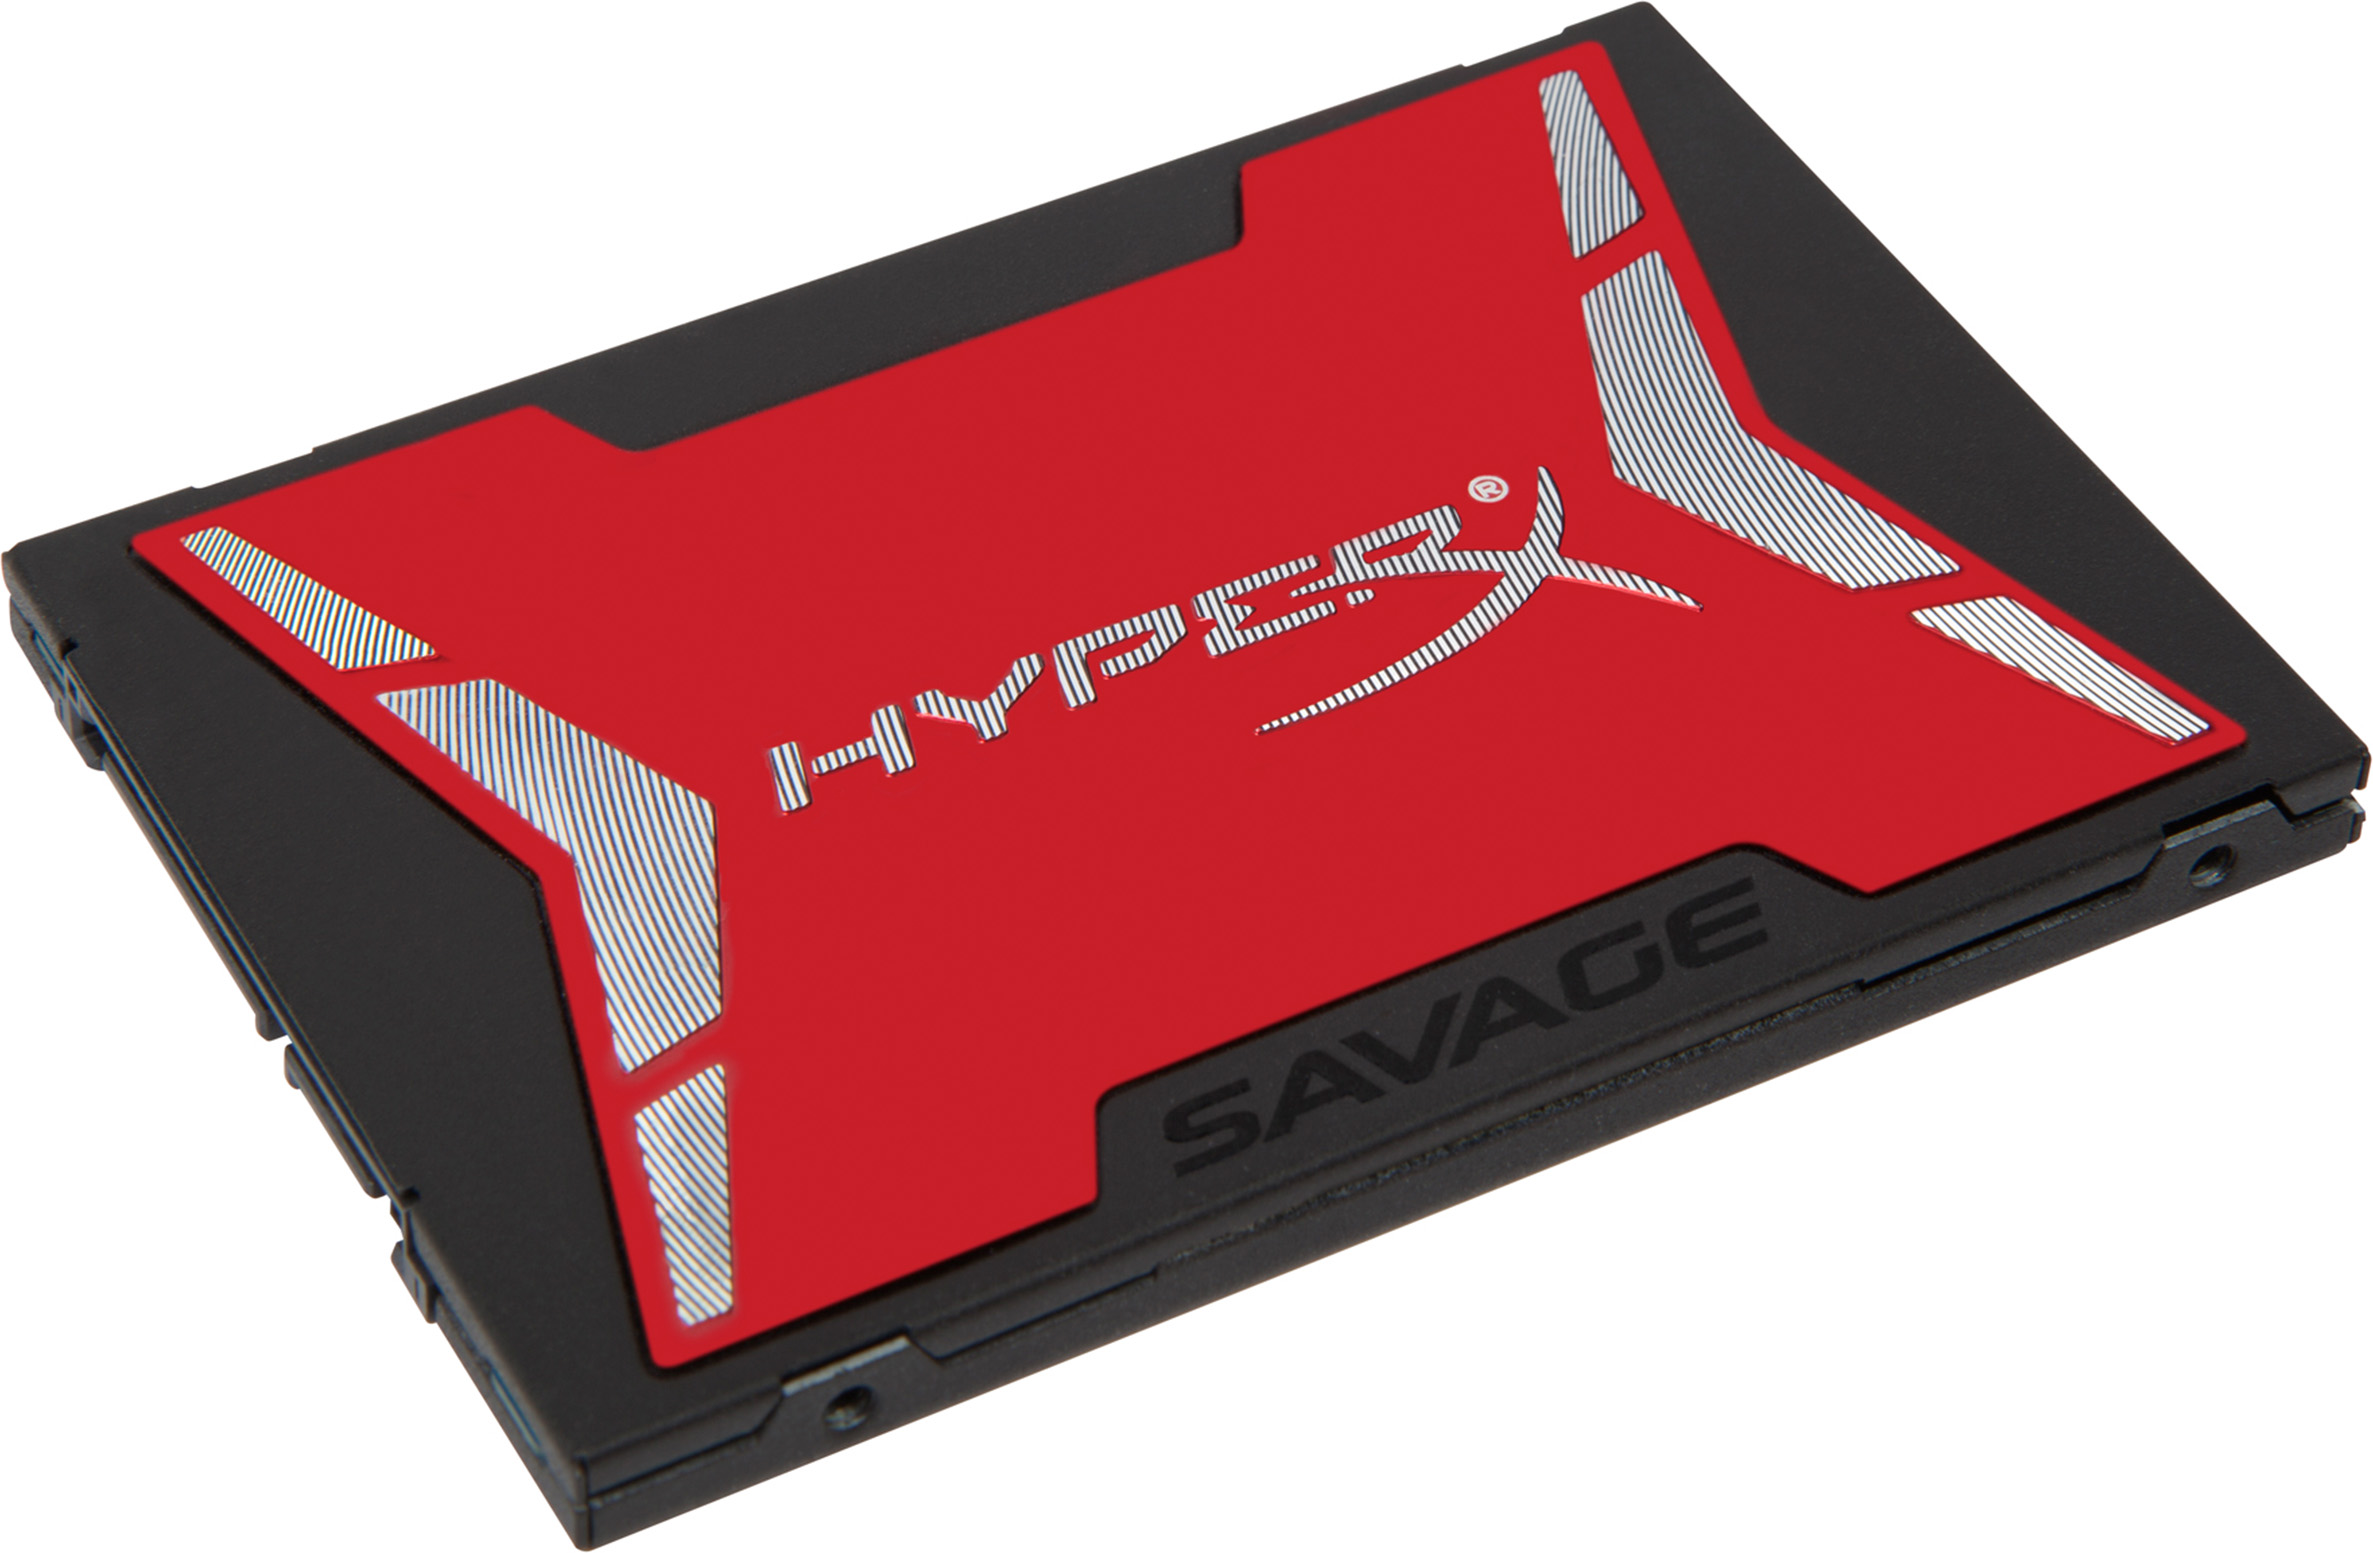 RW6AqA?ver=4cd2 - HyperX Savage SSD (240GB)